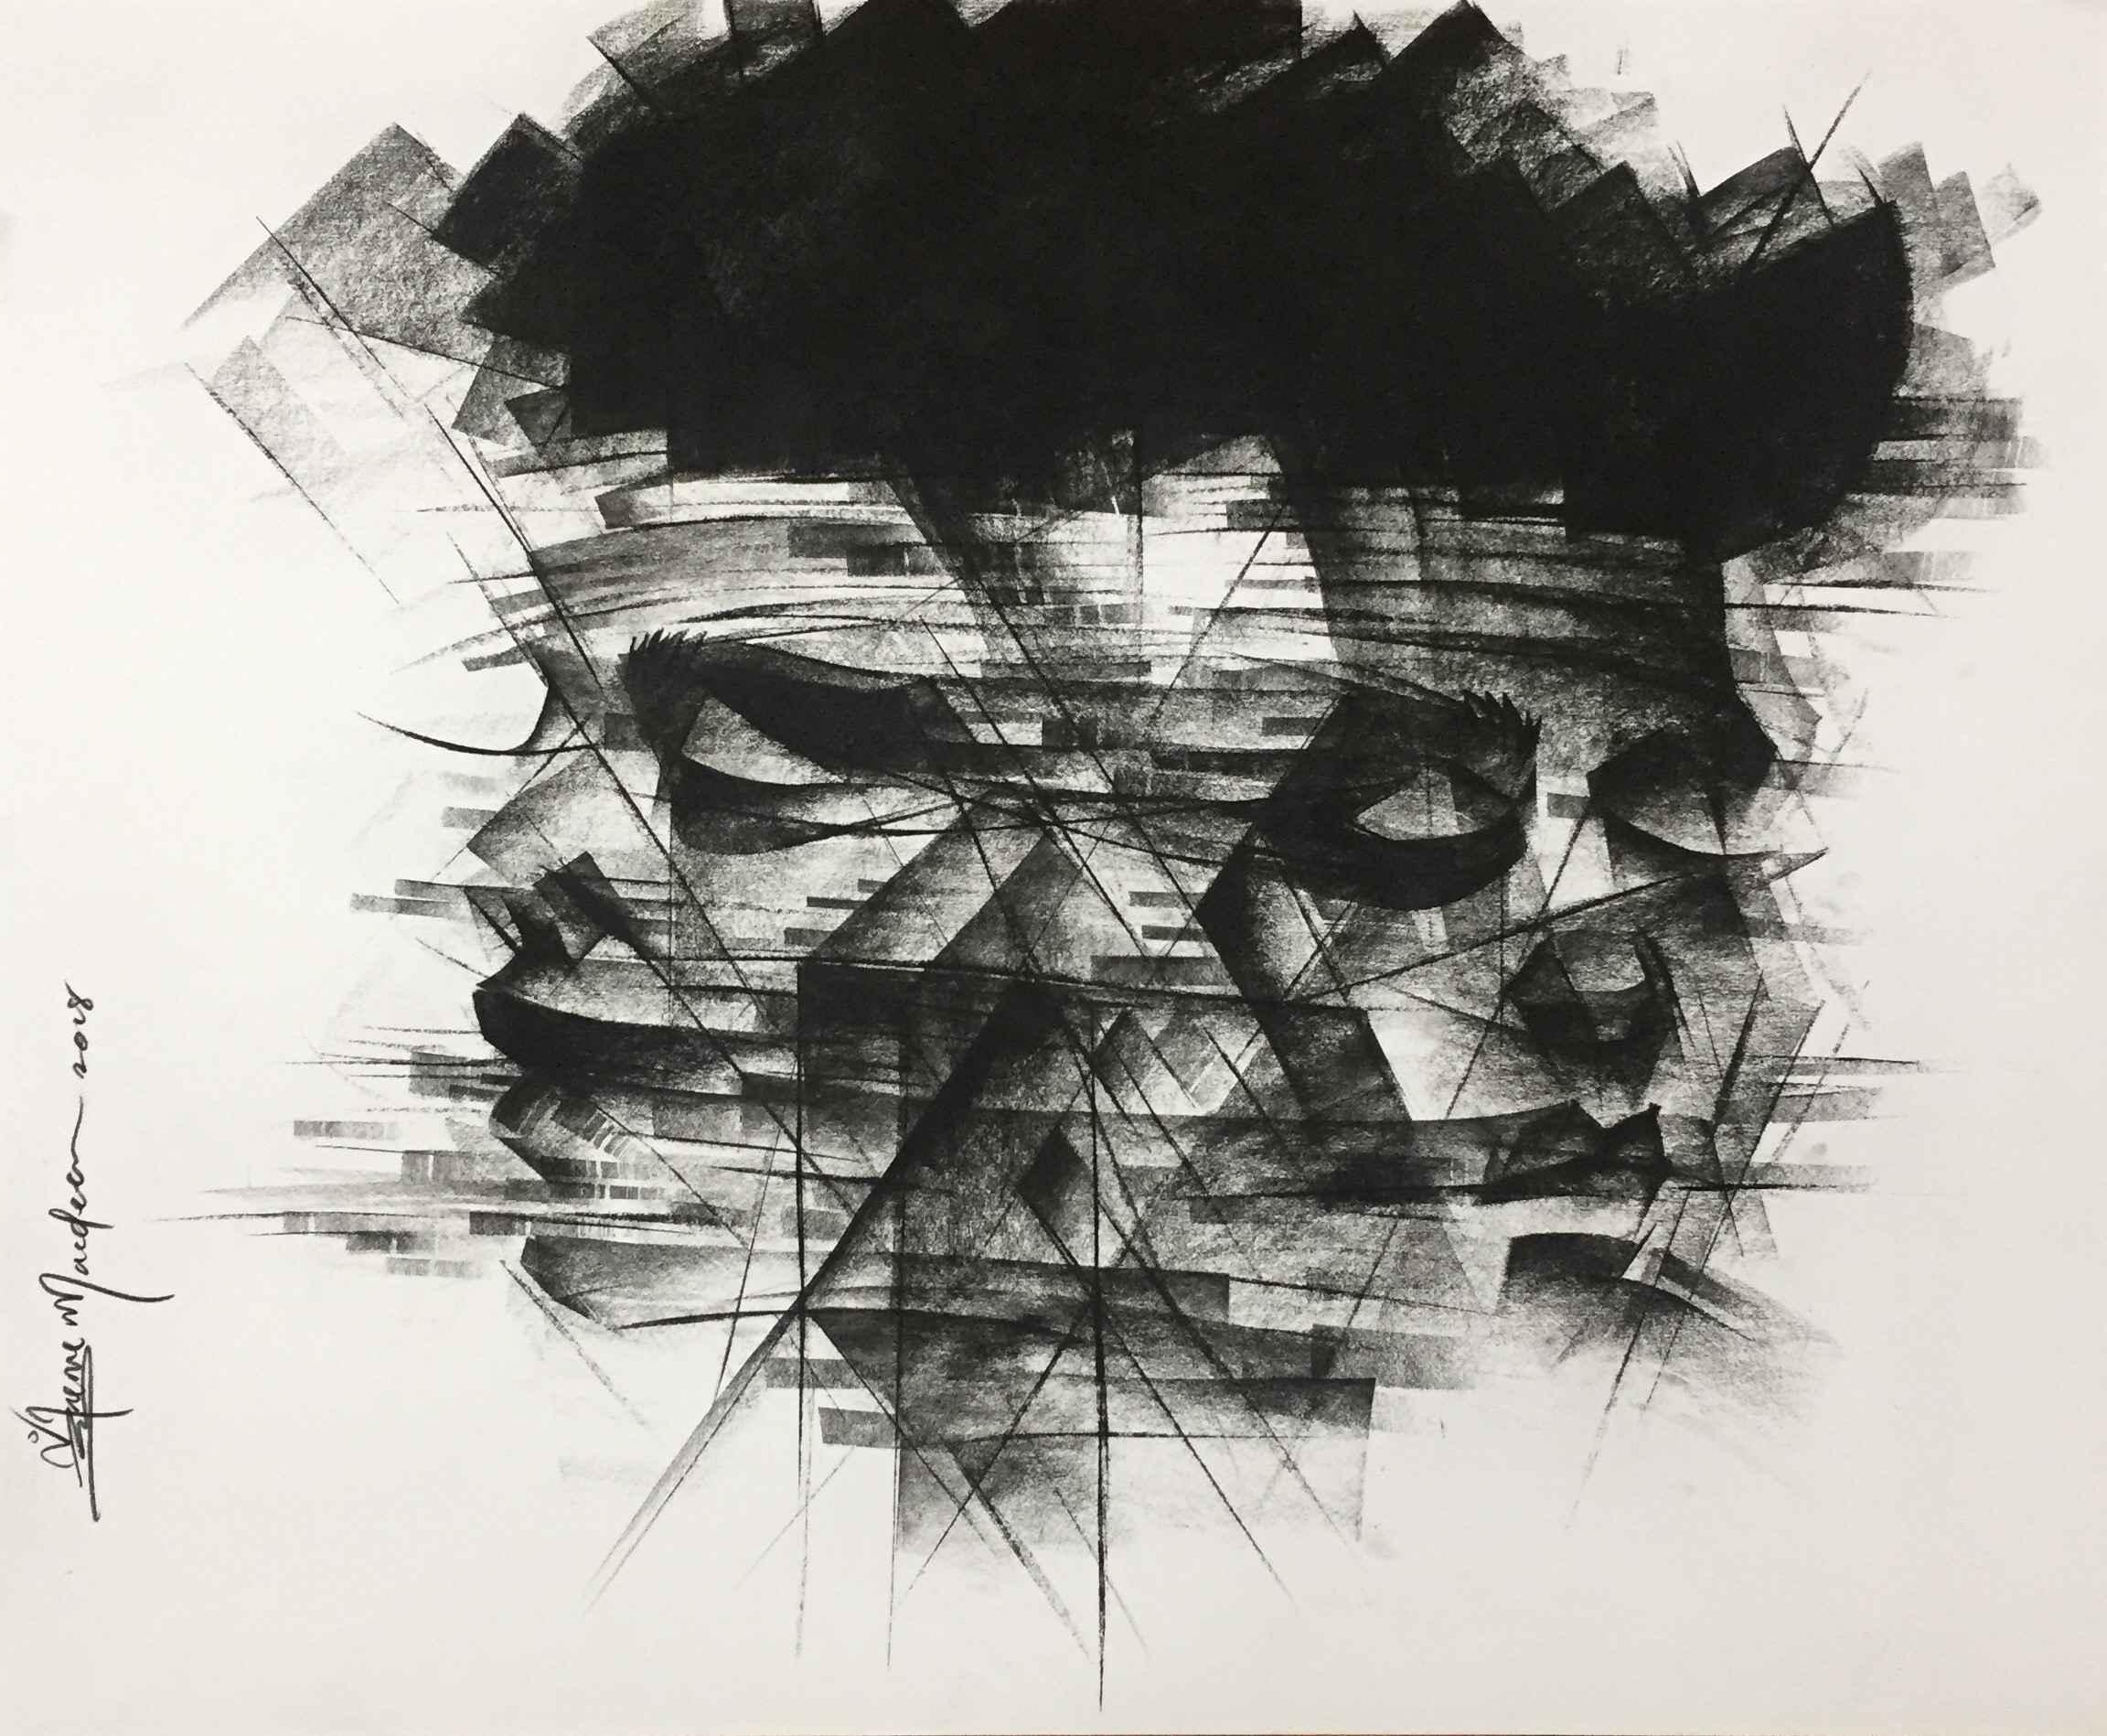 Retro by Mr Mcdonald Iheme - Masterpiece Online